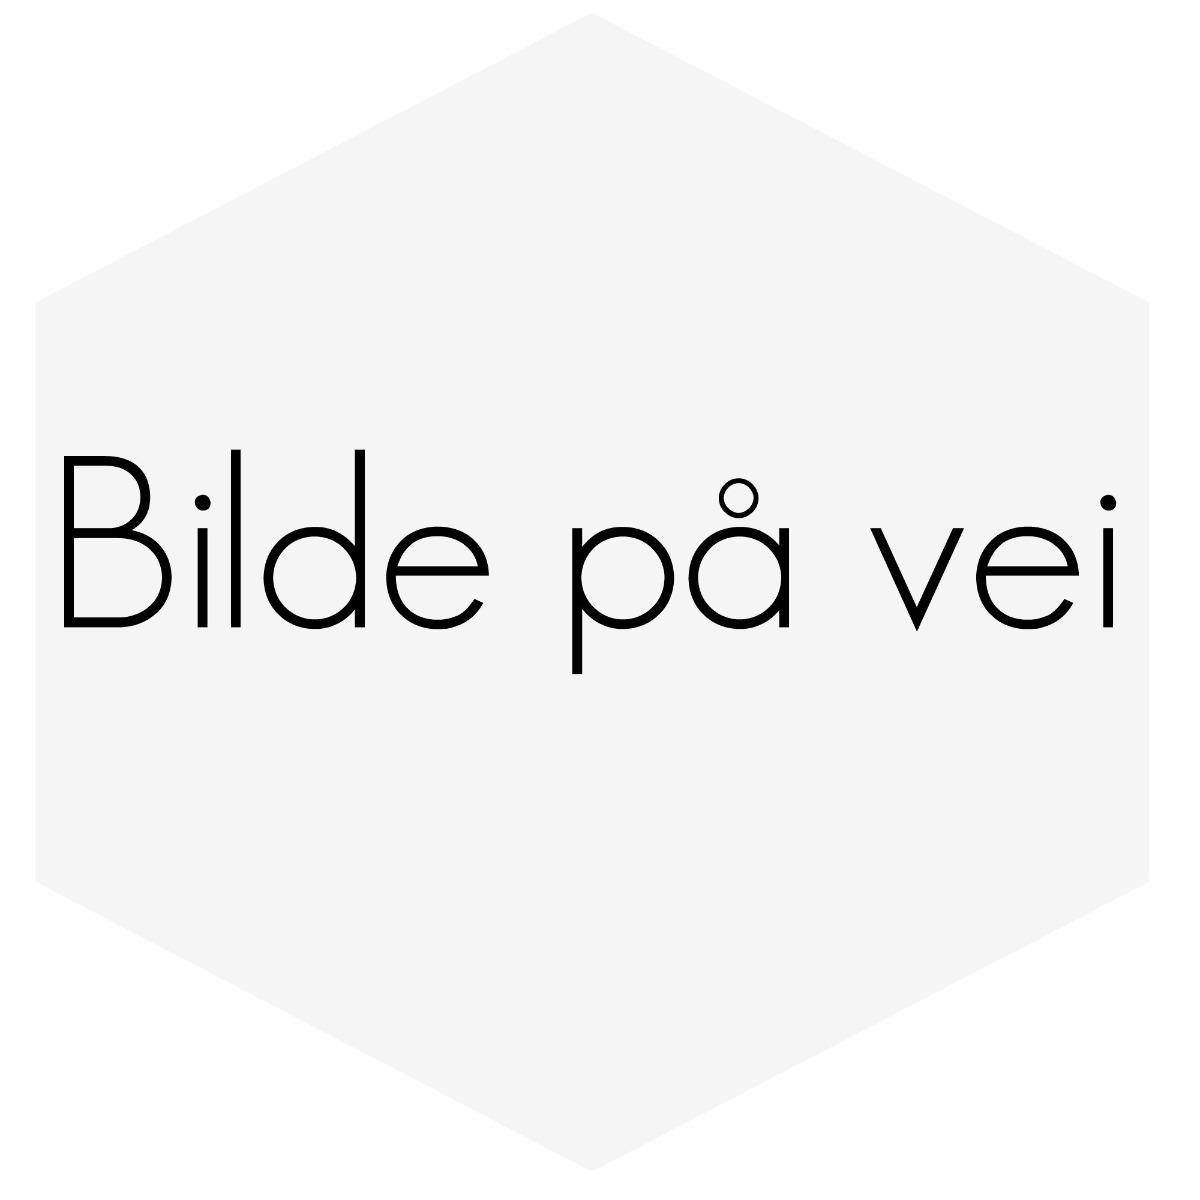 GRILLNETT SØLV RUNDE HULL. PR.STK. 20X110CM